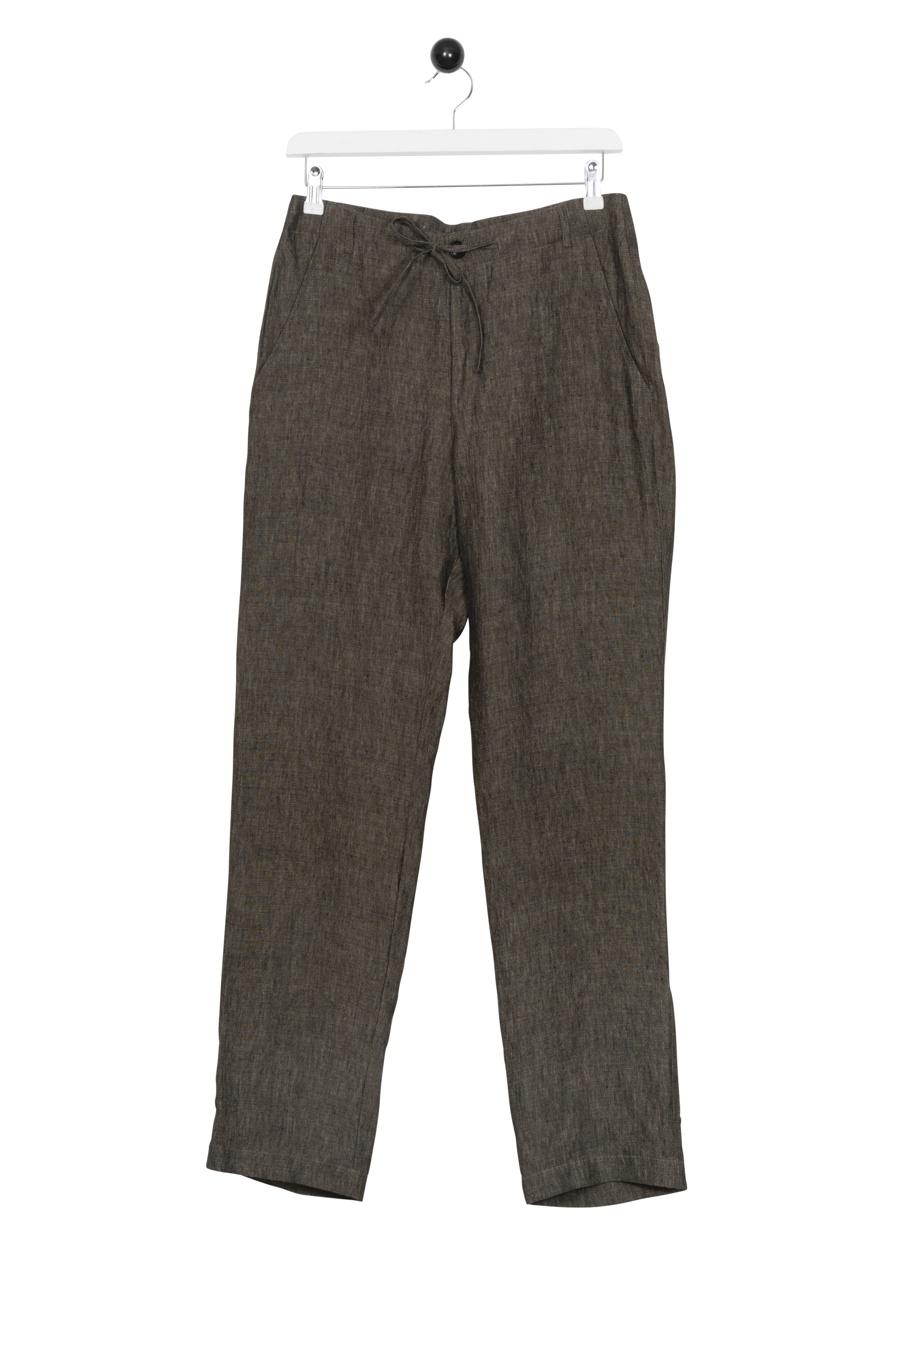 Rochefort Trousers